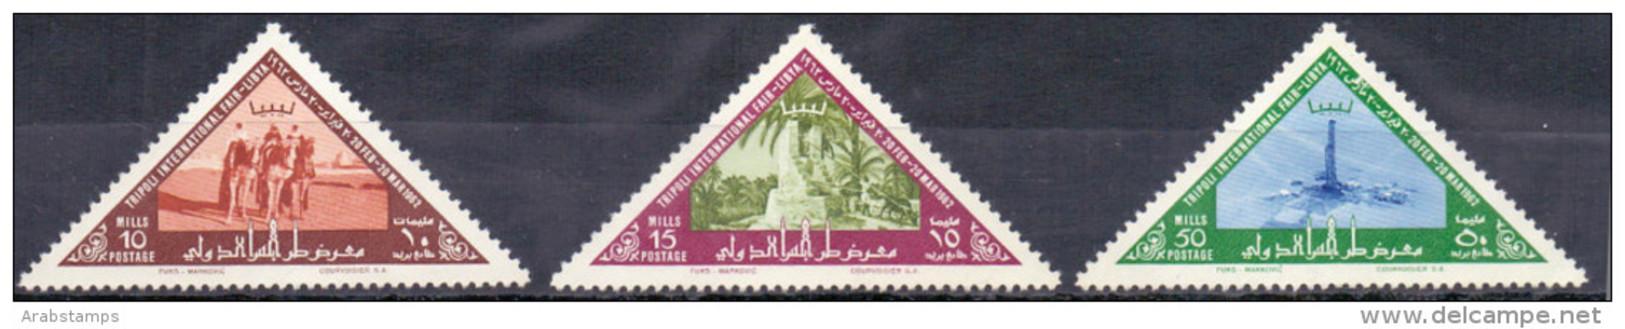 1962 Libya Tripoli International Fair Complete Set 3 Values MNH    (Or Best Offer) - Libya